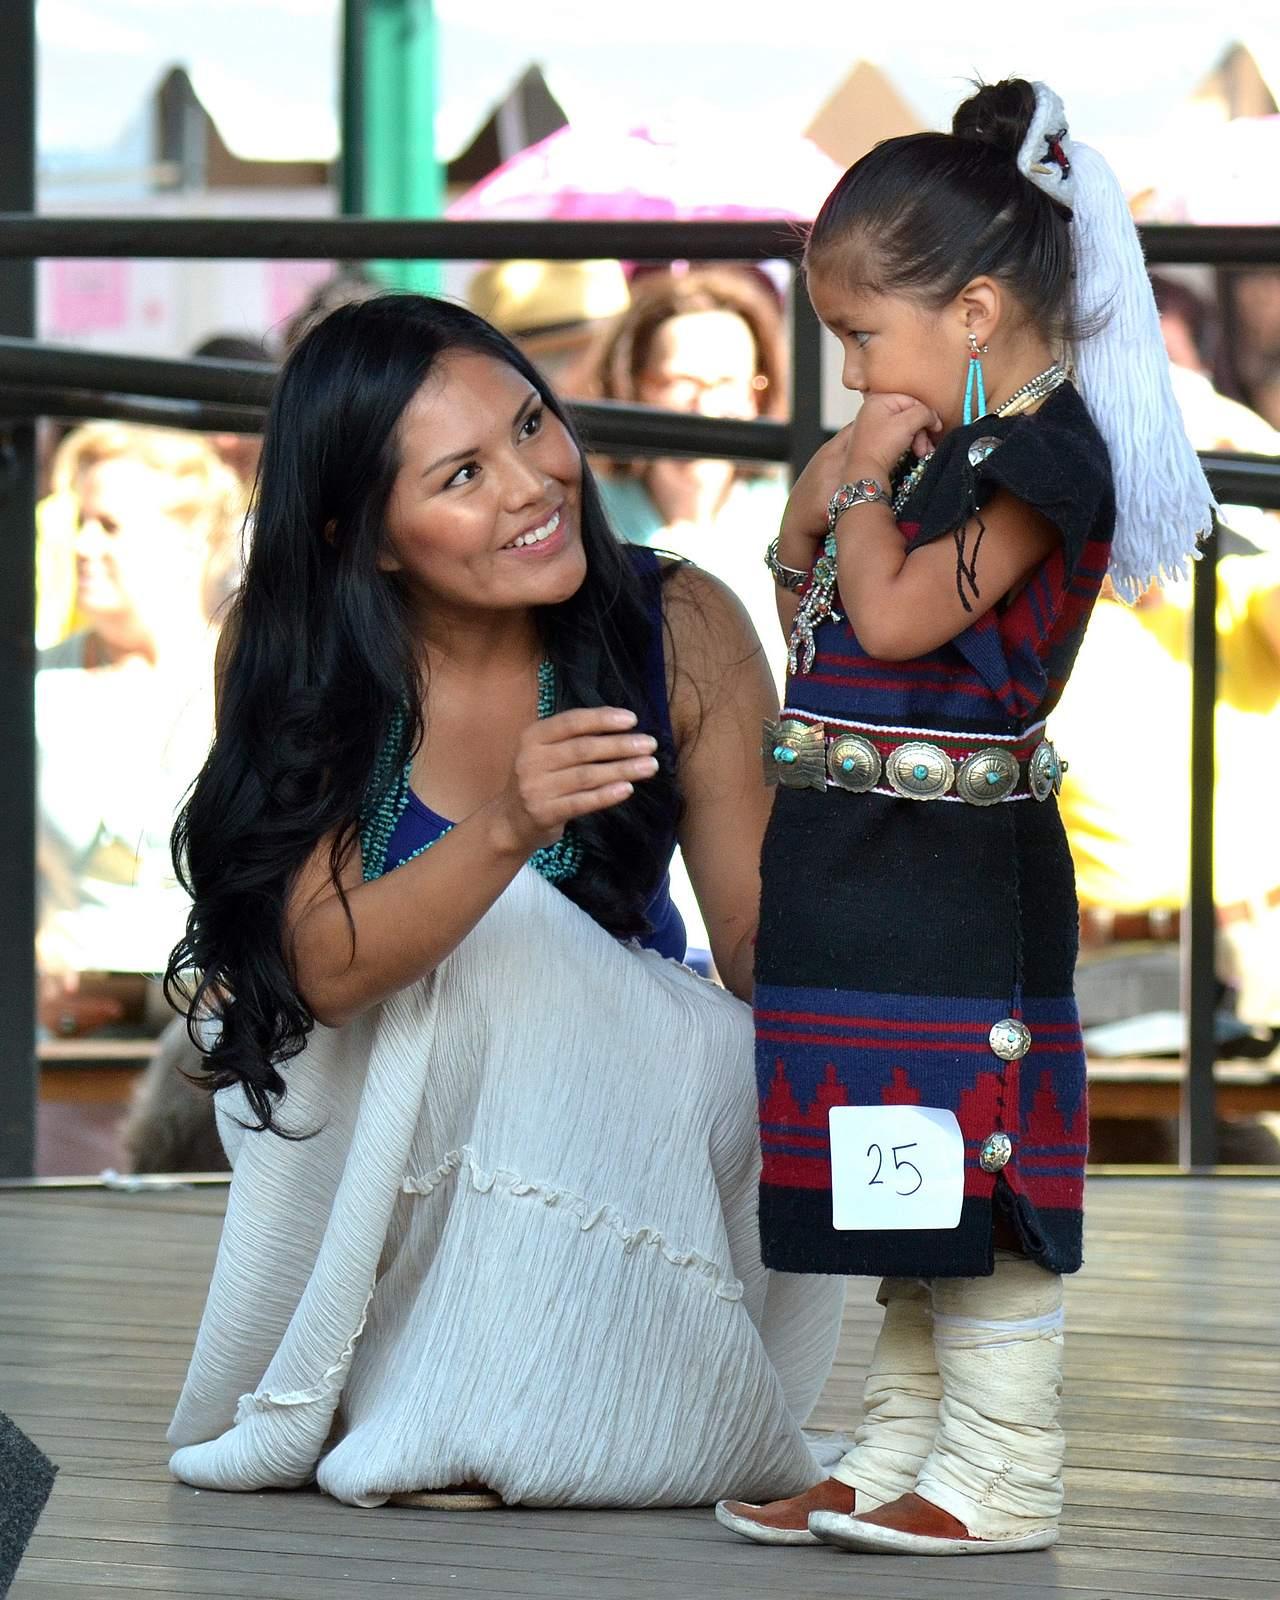 native american clothing13 Native American Clothing Contest at Santa Fe Indian Market